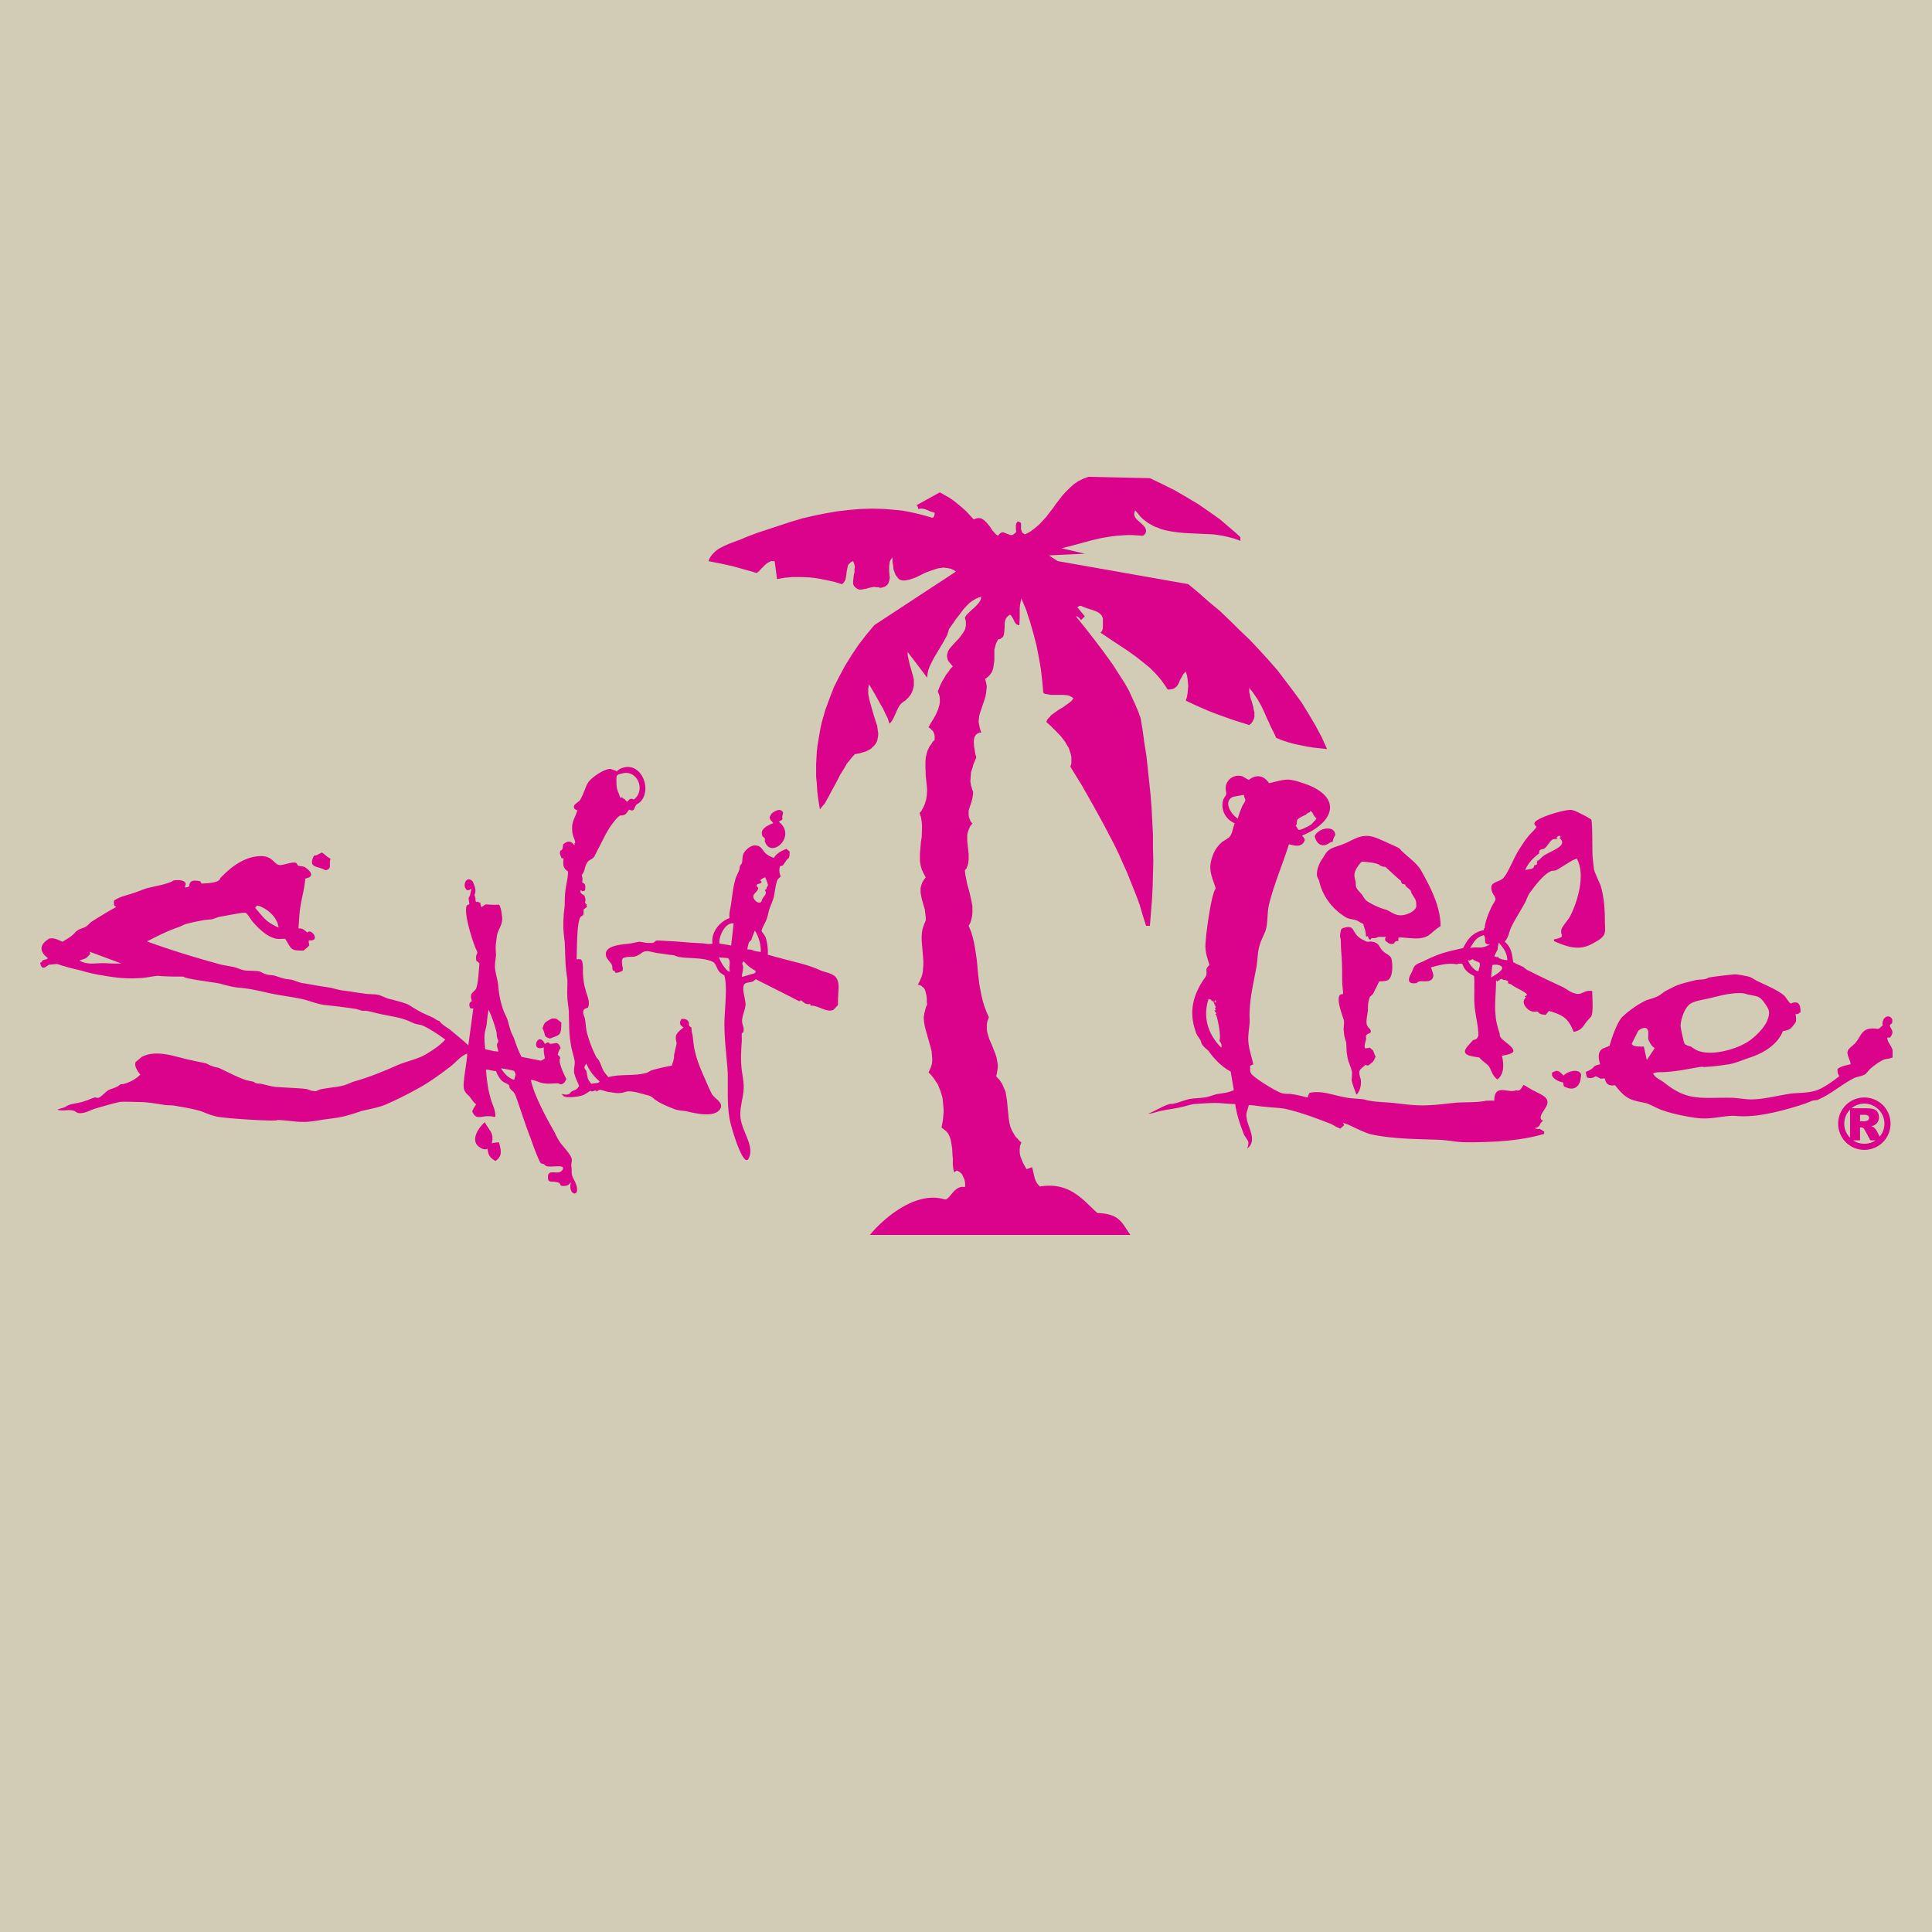 Salt Life Signature Decal Salt Life Decals Tree Decals Salt Life Quotes [ 2500 x 2500 Pixel ]